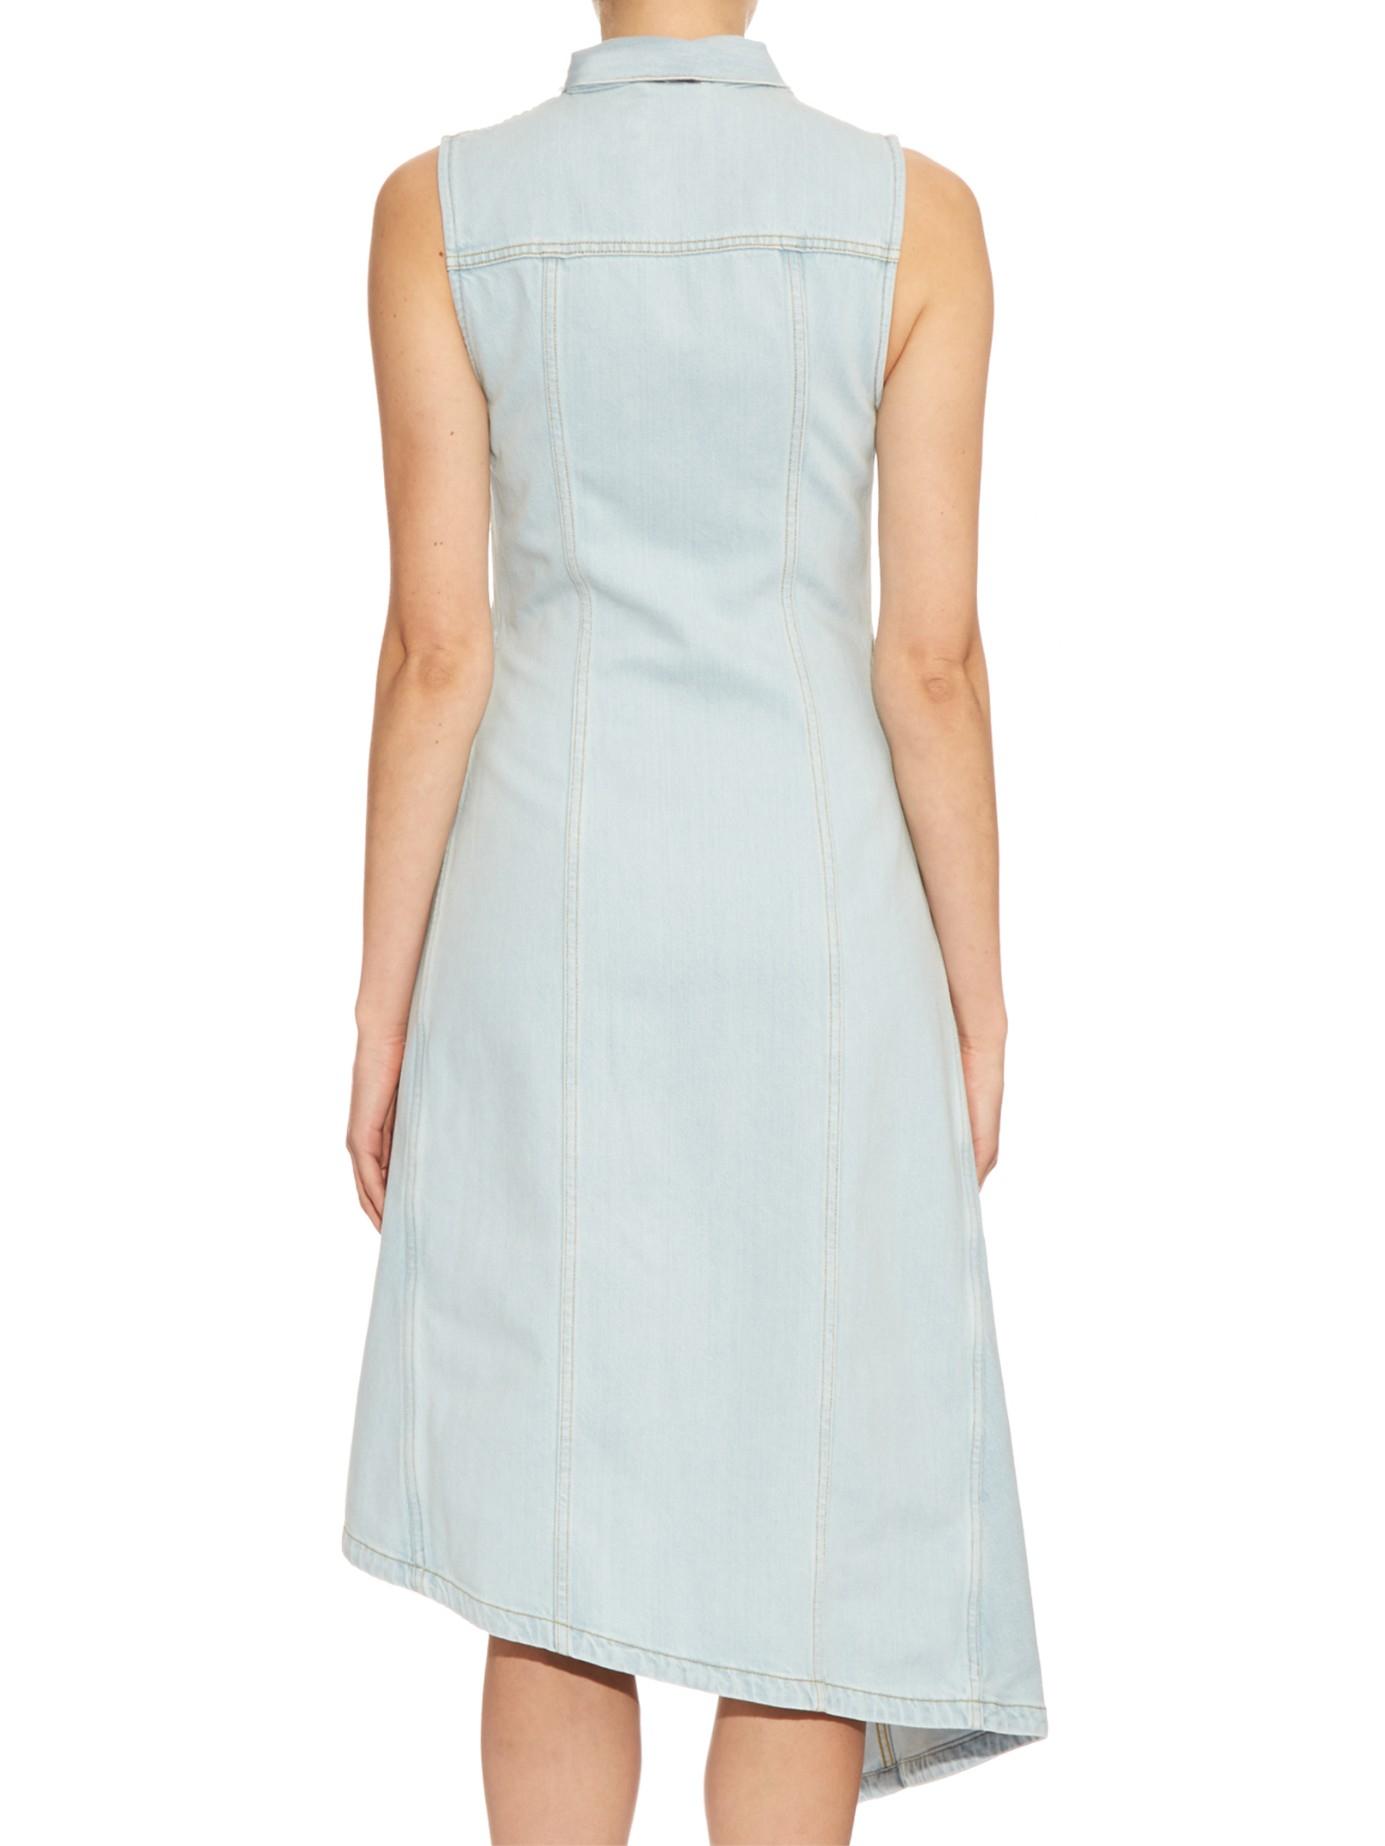 Lyst Acne Studios Carda Denim Dress In Blue